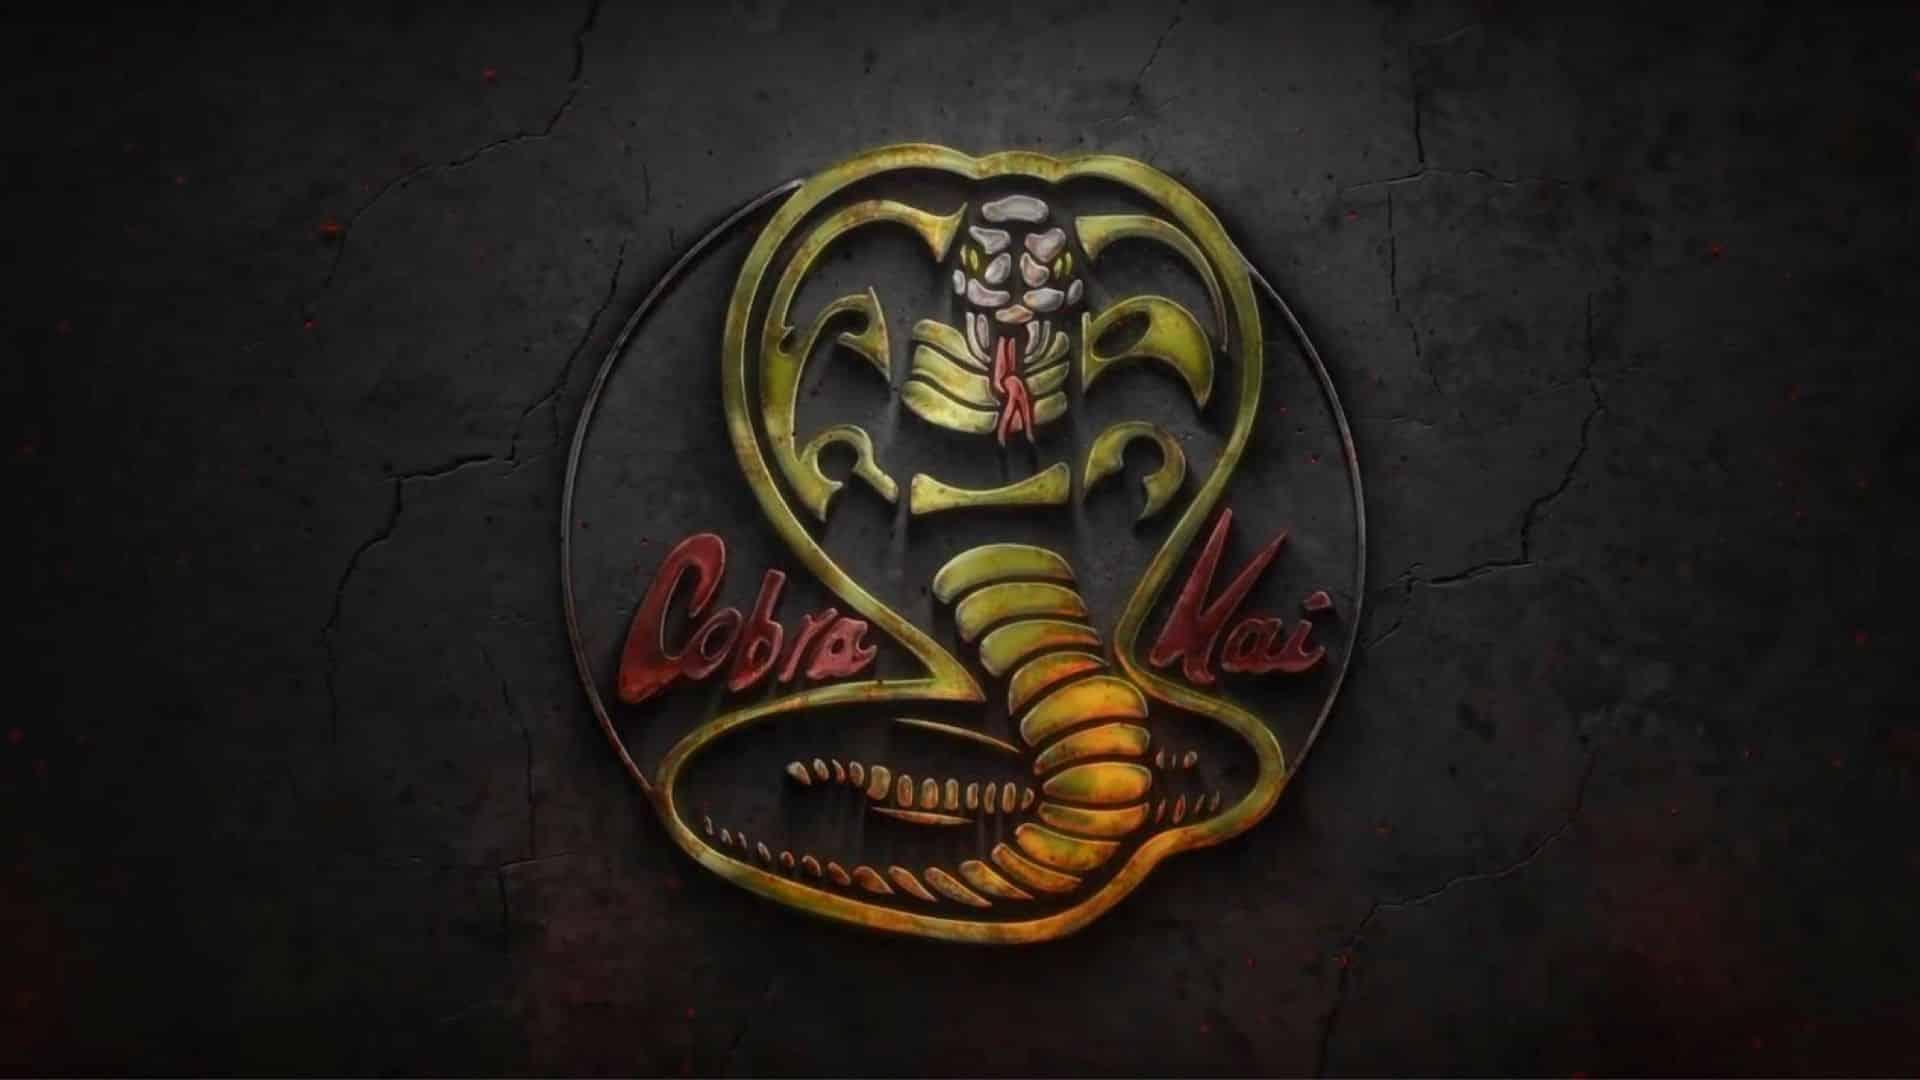 Quand sortira la saison 3 de Cobra Kai de Netflix ? 37